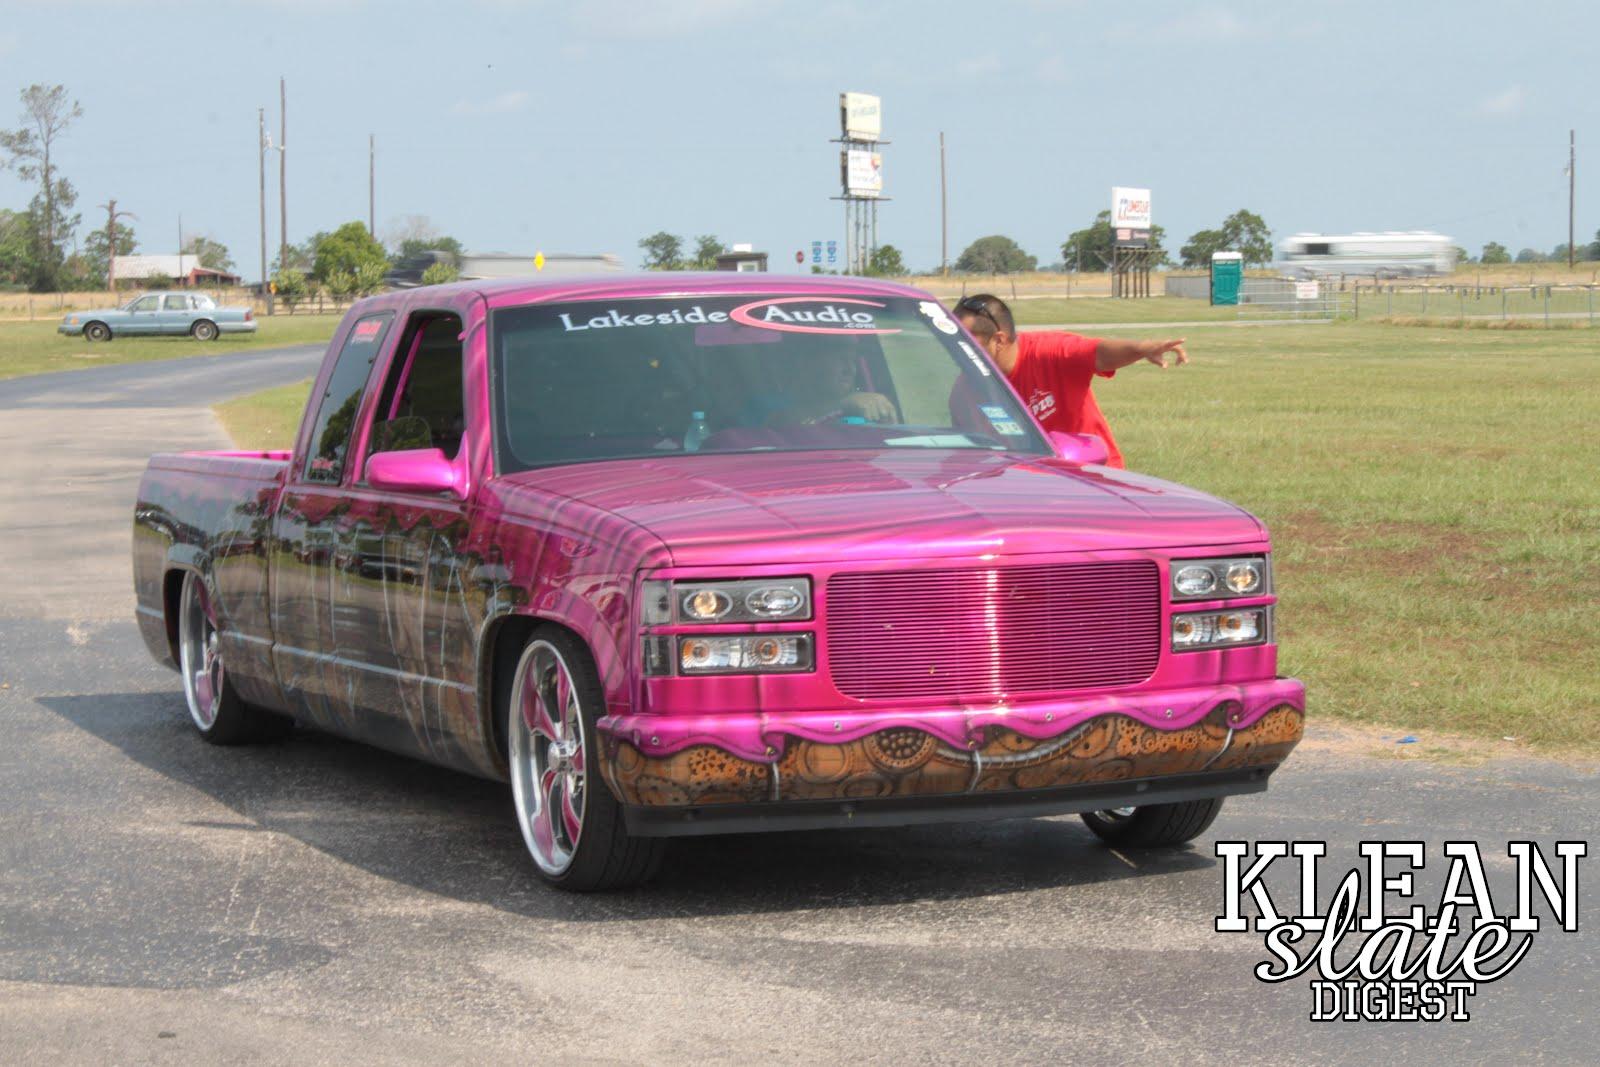 Houston Custom Car Expo 2012 Kleanslatedigest